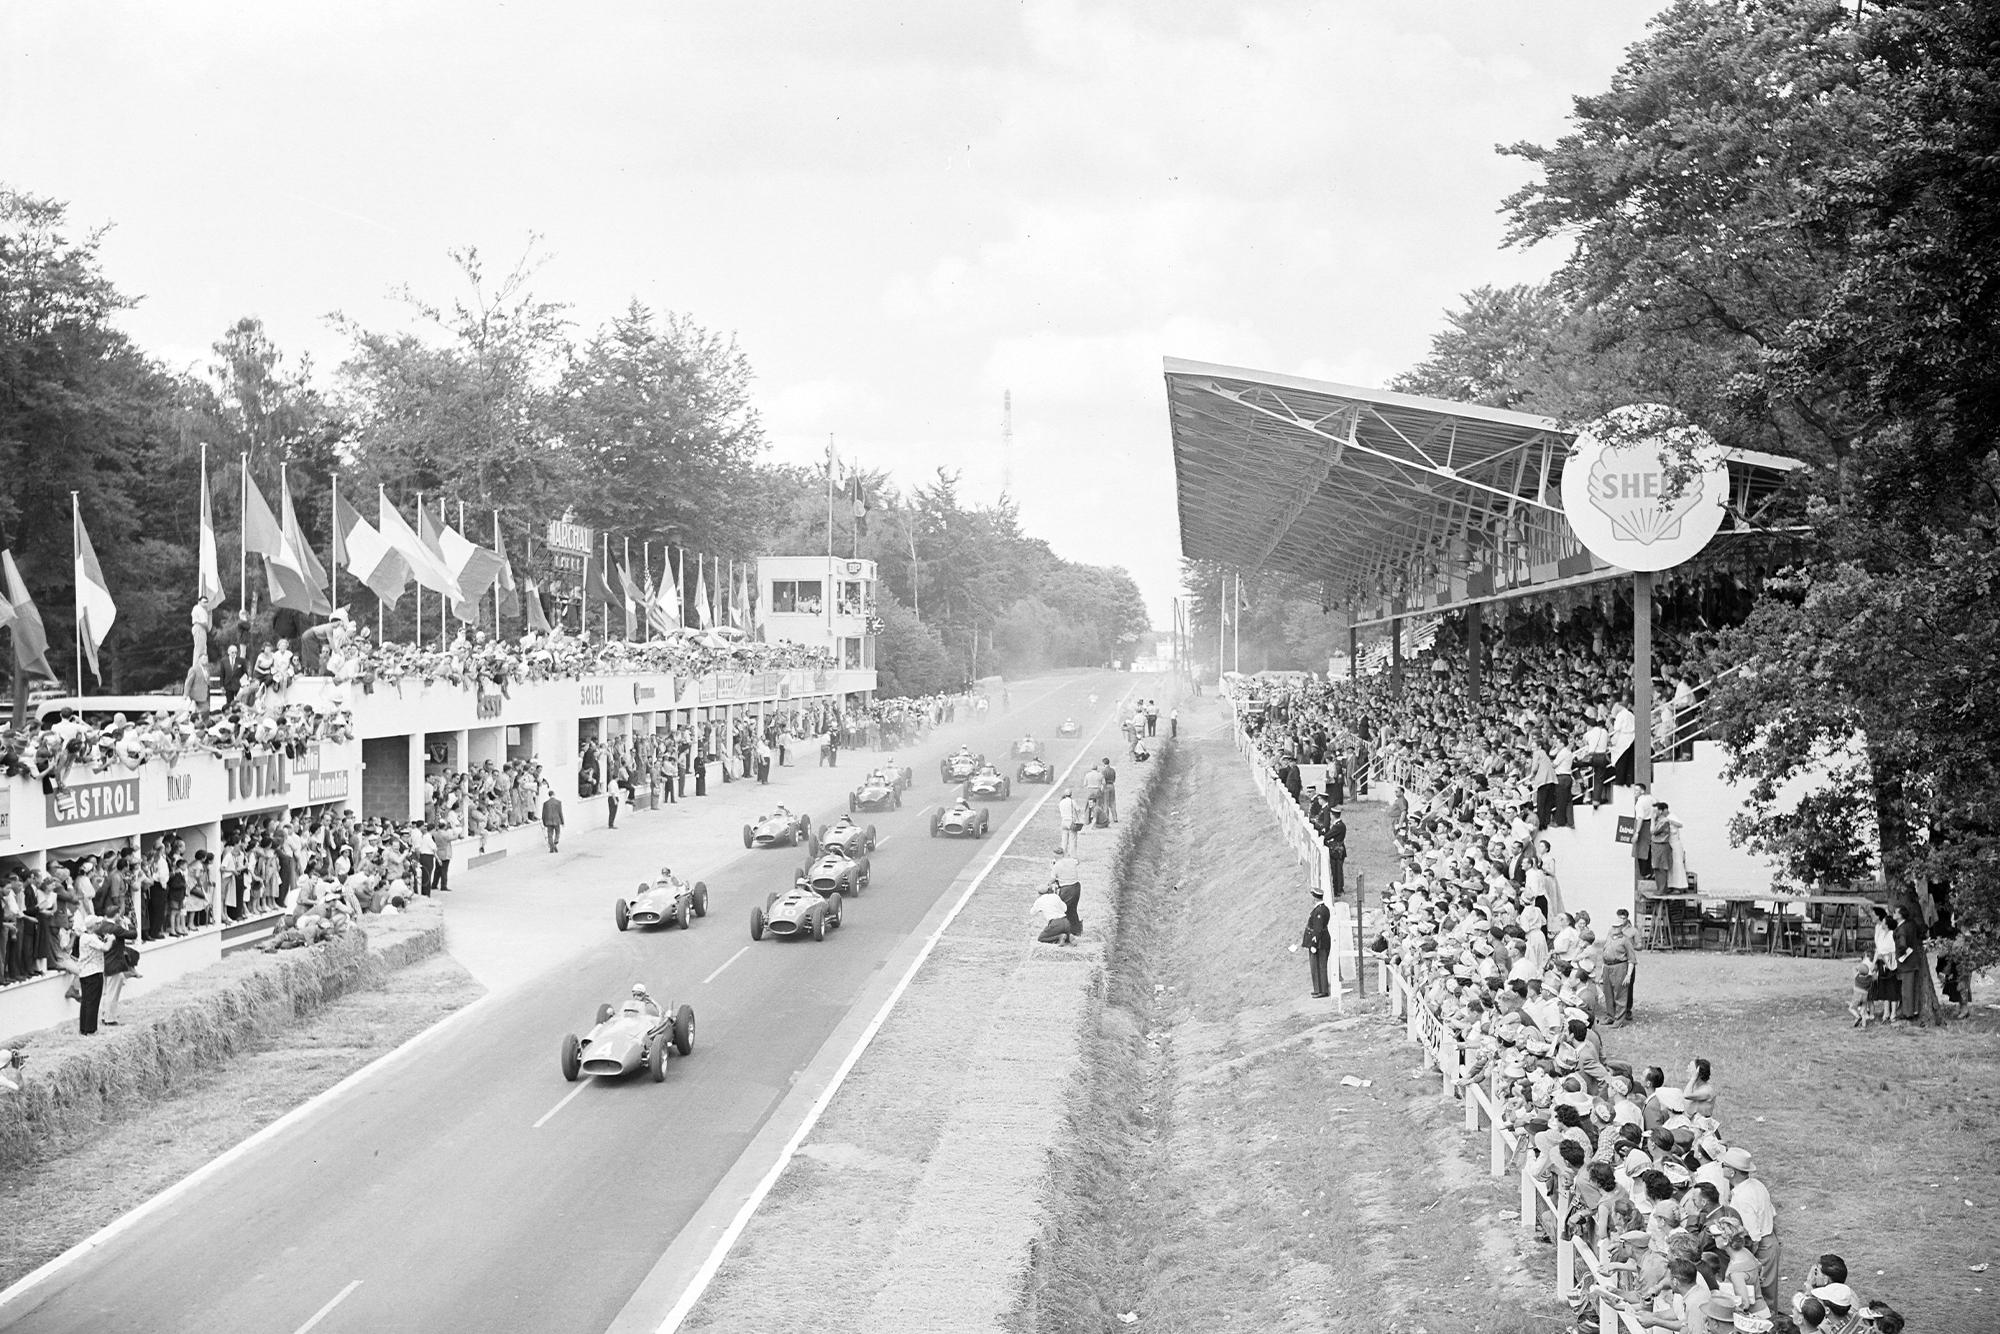 Jean Behra, Maserati 250F, leads Luigi Musso, Ferrari D50 (#10), Juan Manuel Fangio, Maserati 250F (#2), and Peter Collins, Ferrari D50 (#12), at the start of the 1957 French Grand Prix.